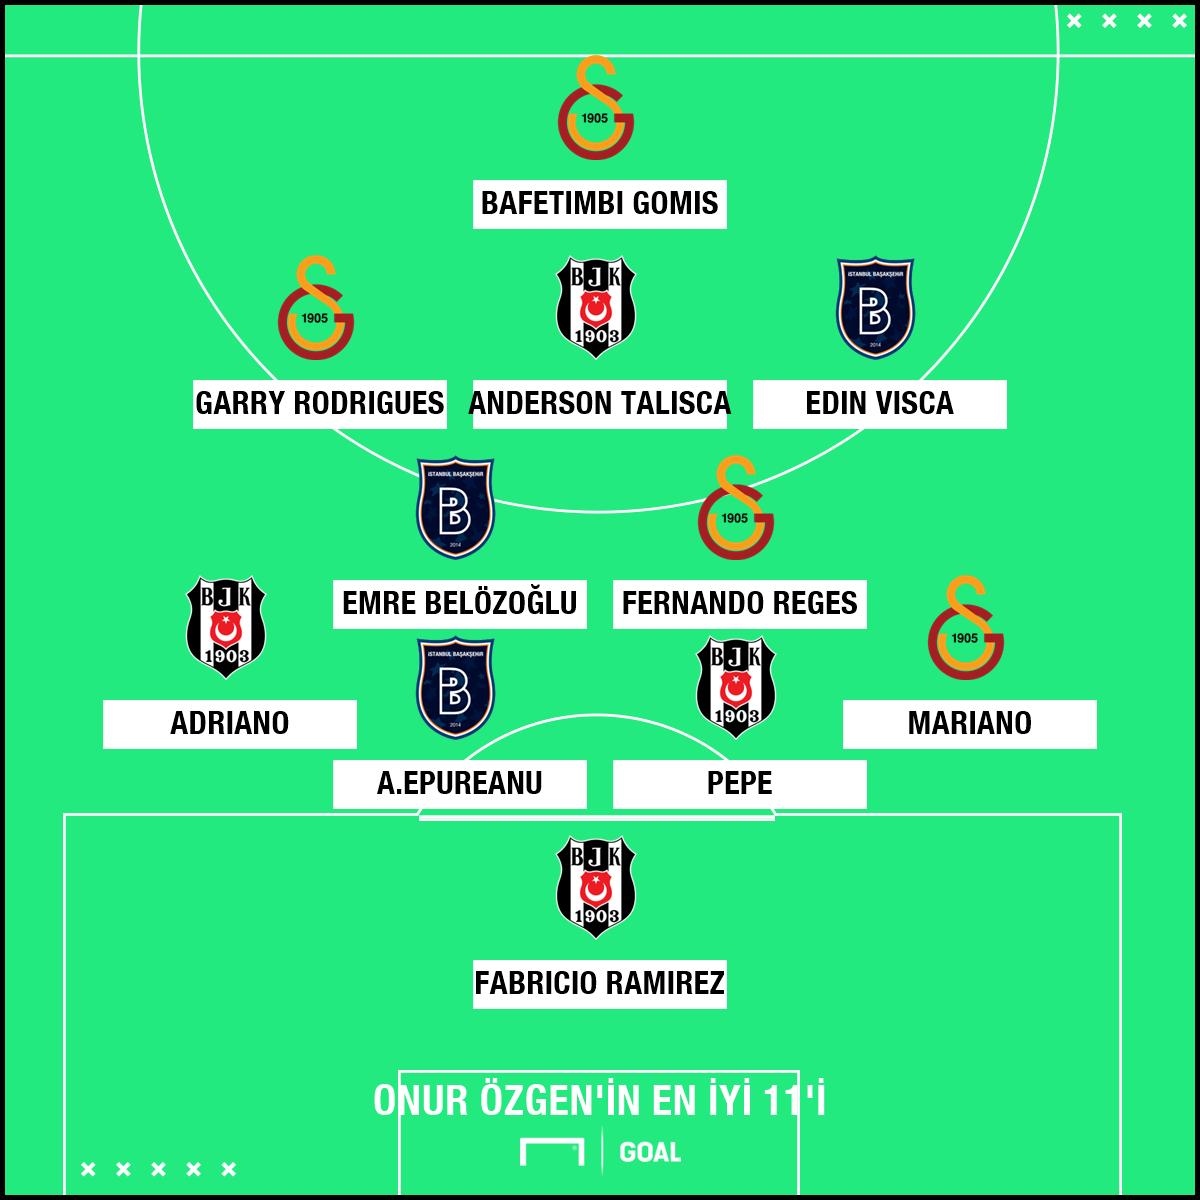 Onur Ozgen Best XI